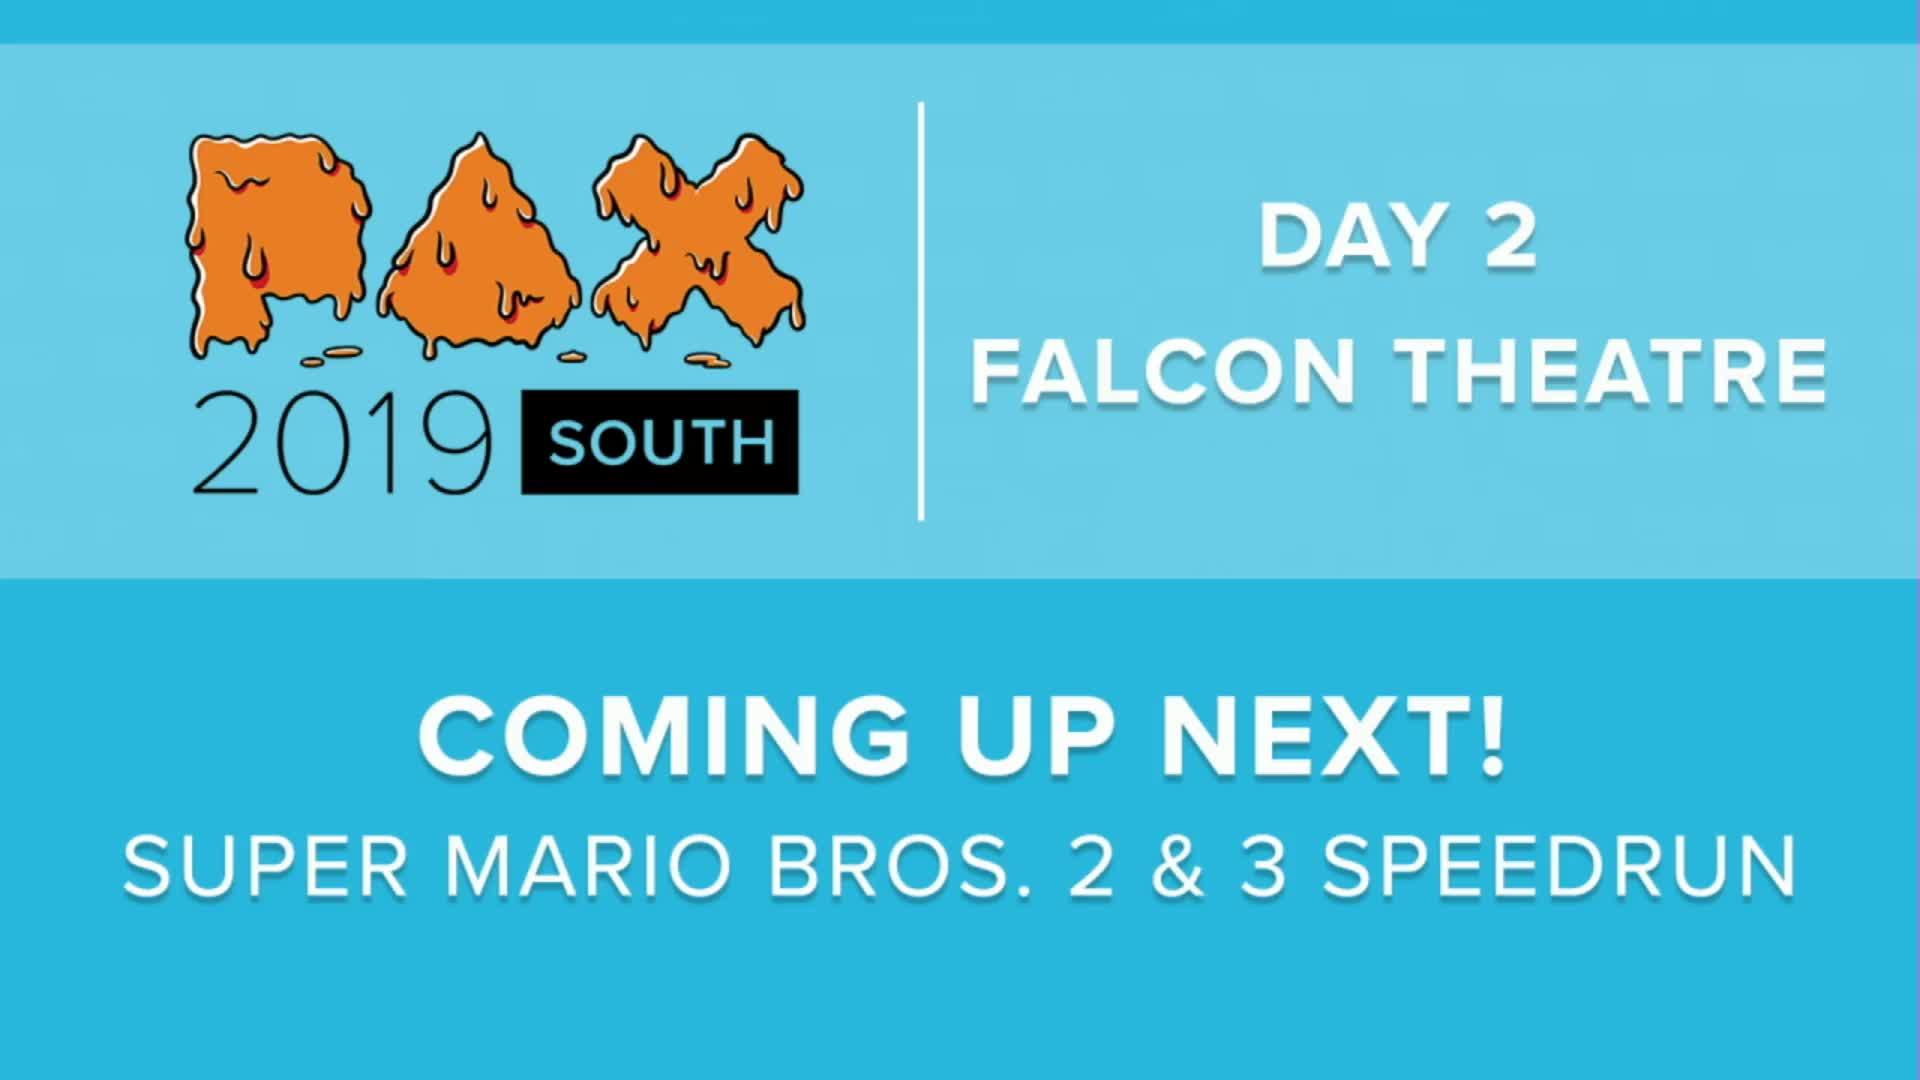 PAX2 - PAX SOUTH 2019 - Super Mario Bros  2 & 3 Speedrun